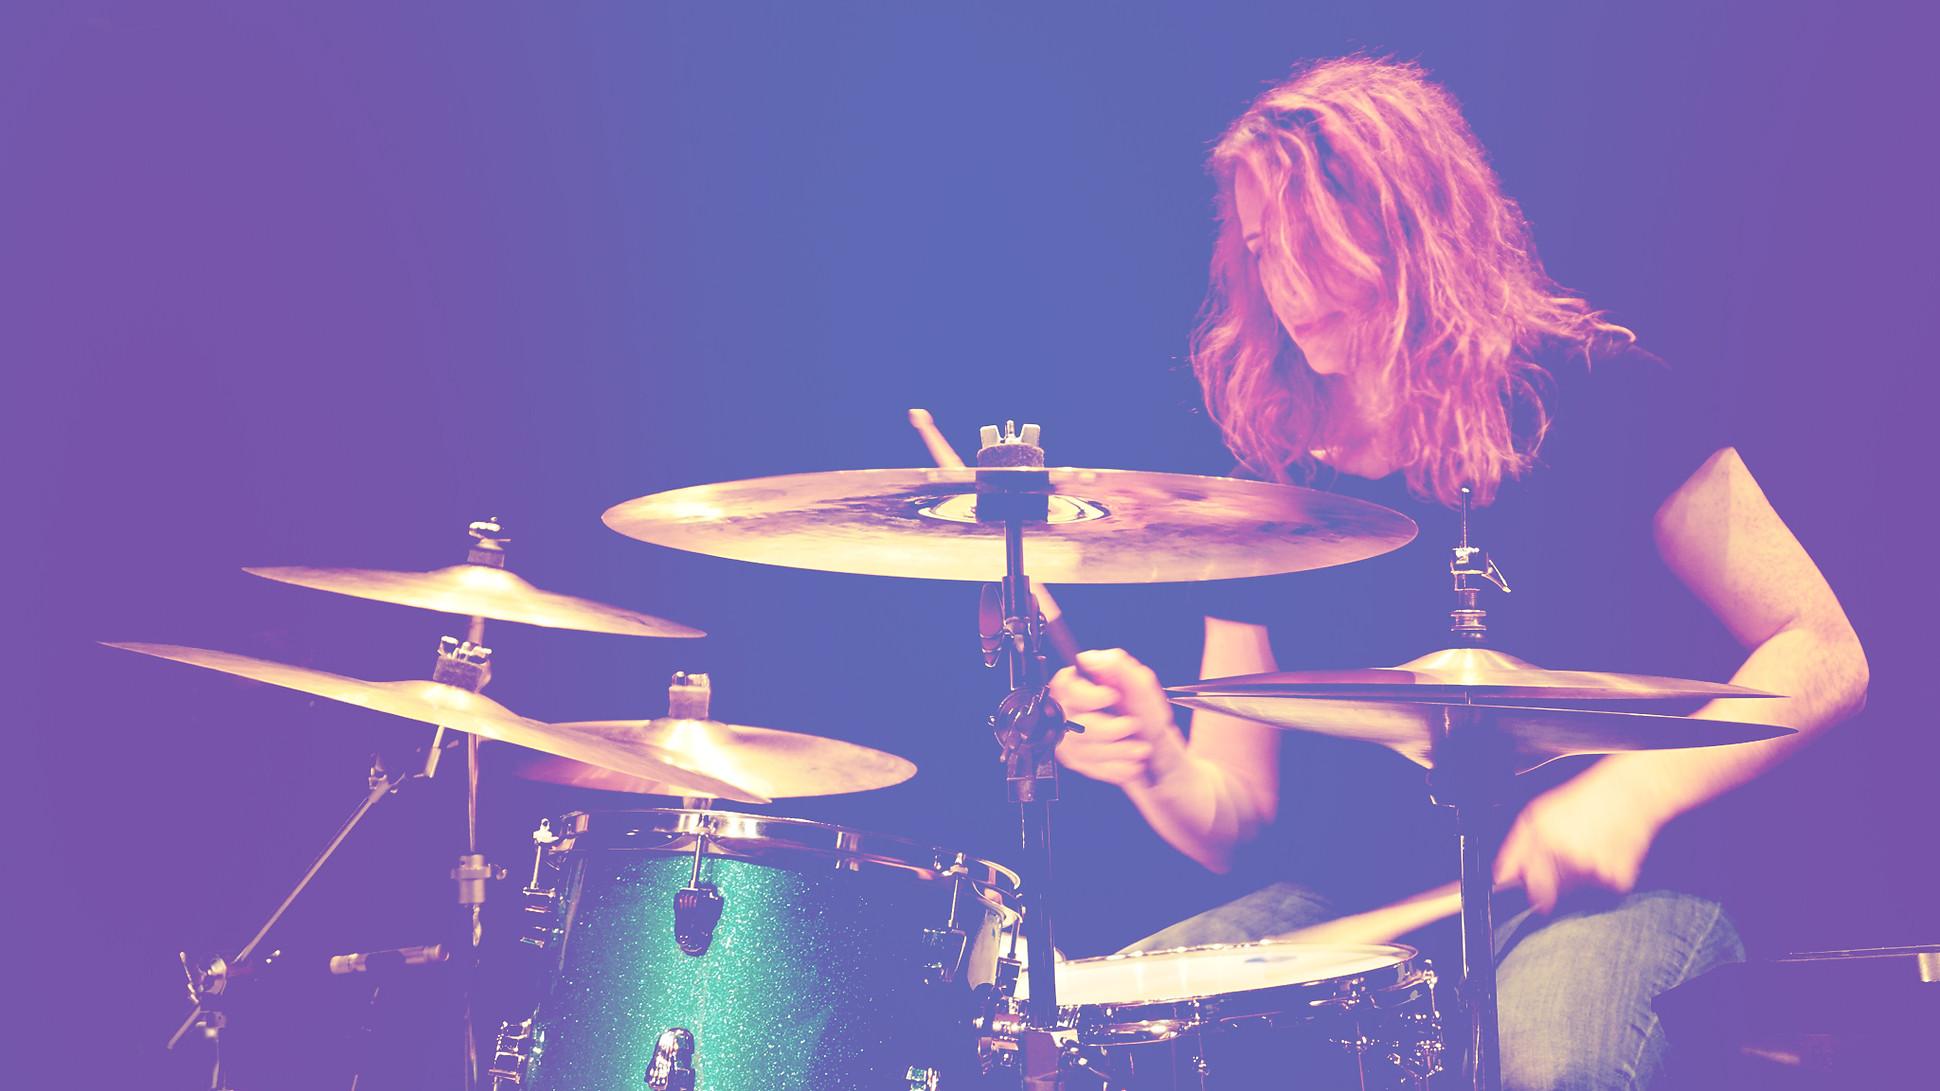 Emma smiley hair 1 purple.jpg